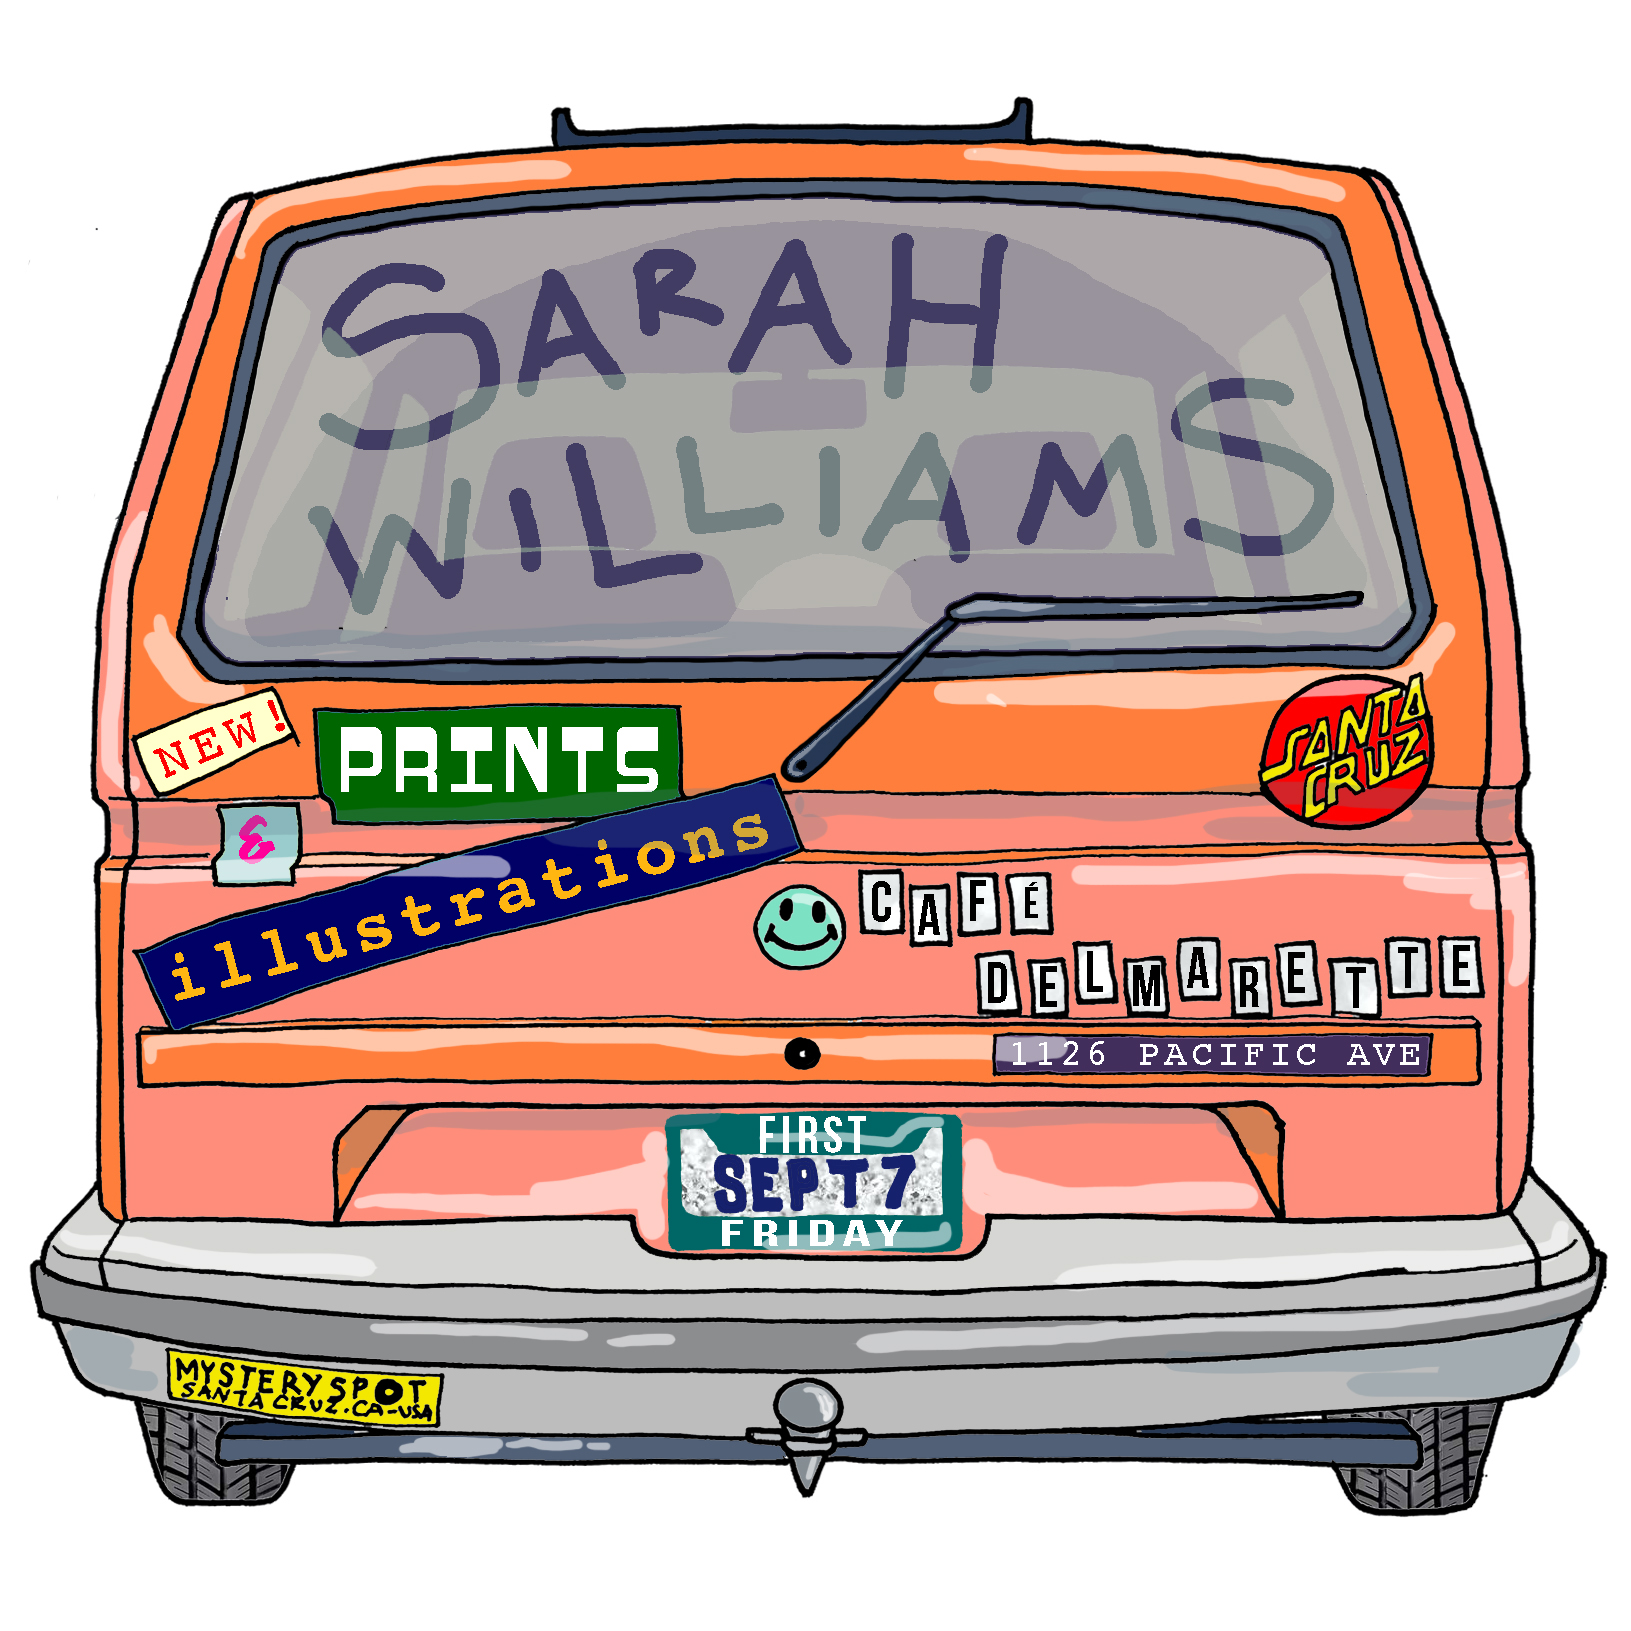 Sarah Williams Solo Show Flyer Design